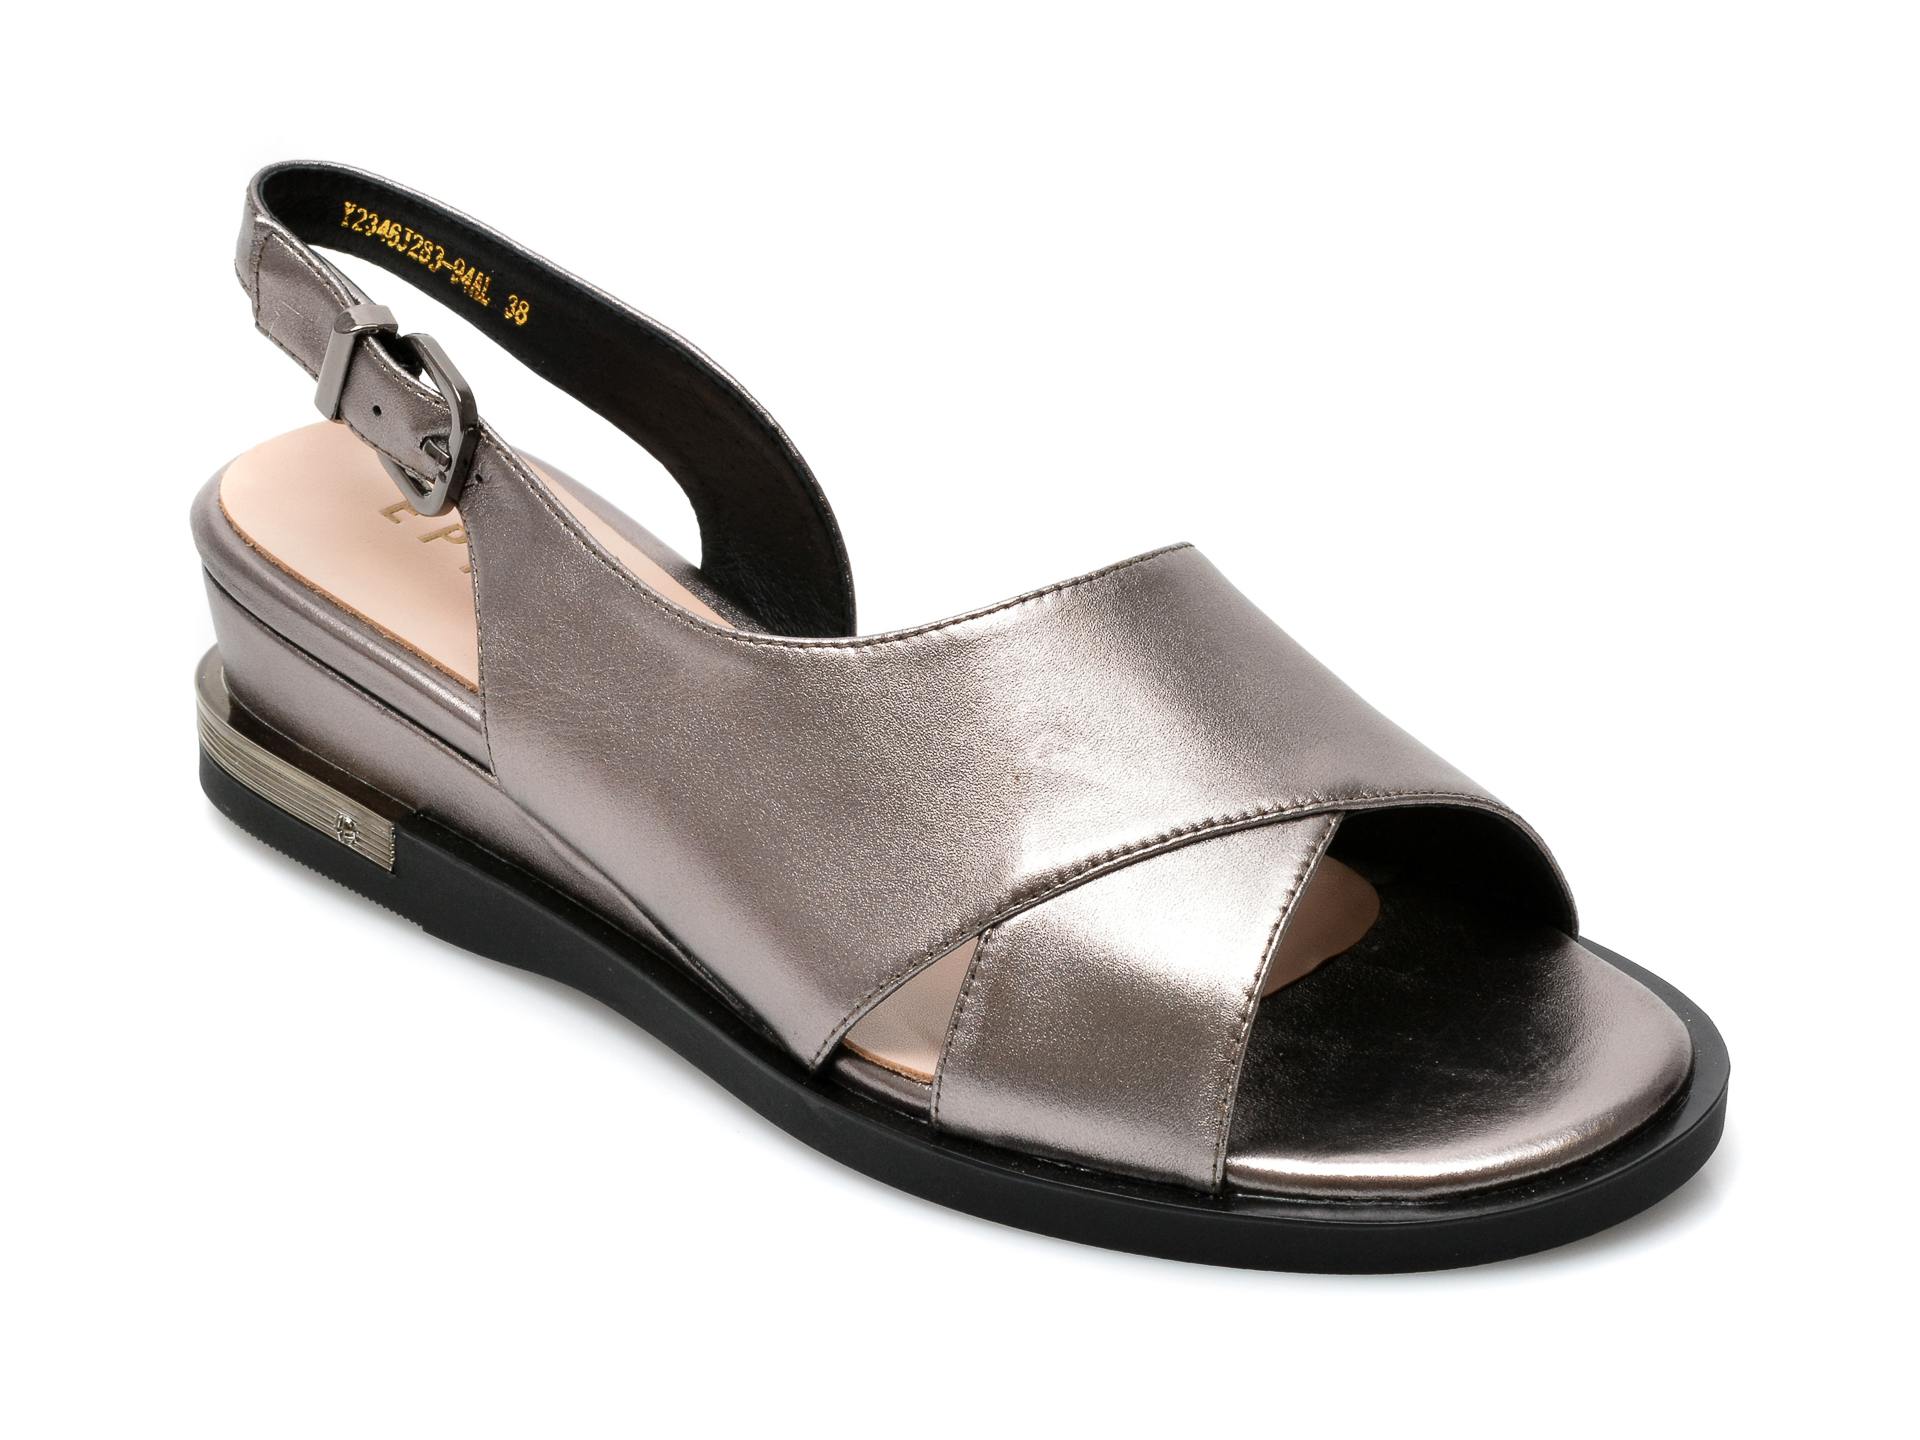 Sandale EPICA argintii, Y2346J2, din piele naturala imagine otter.ro 2021